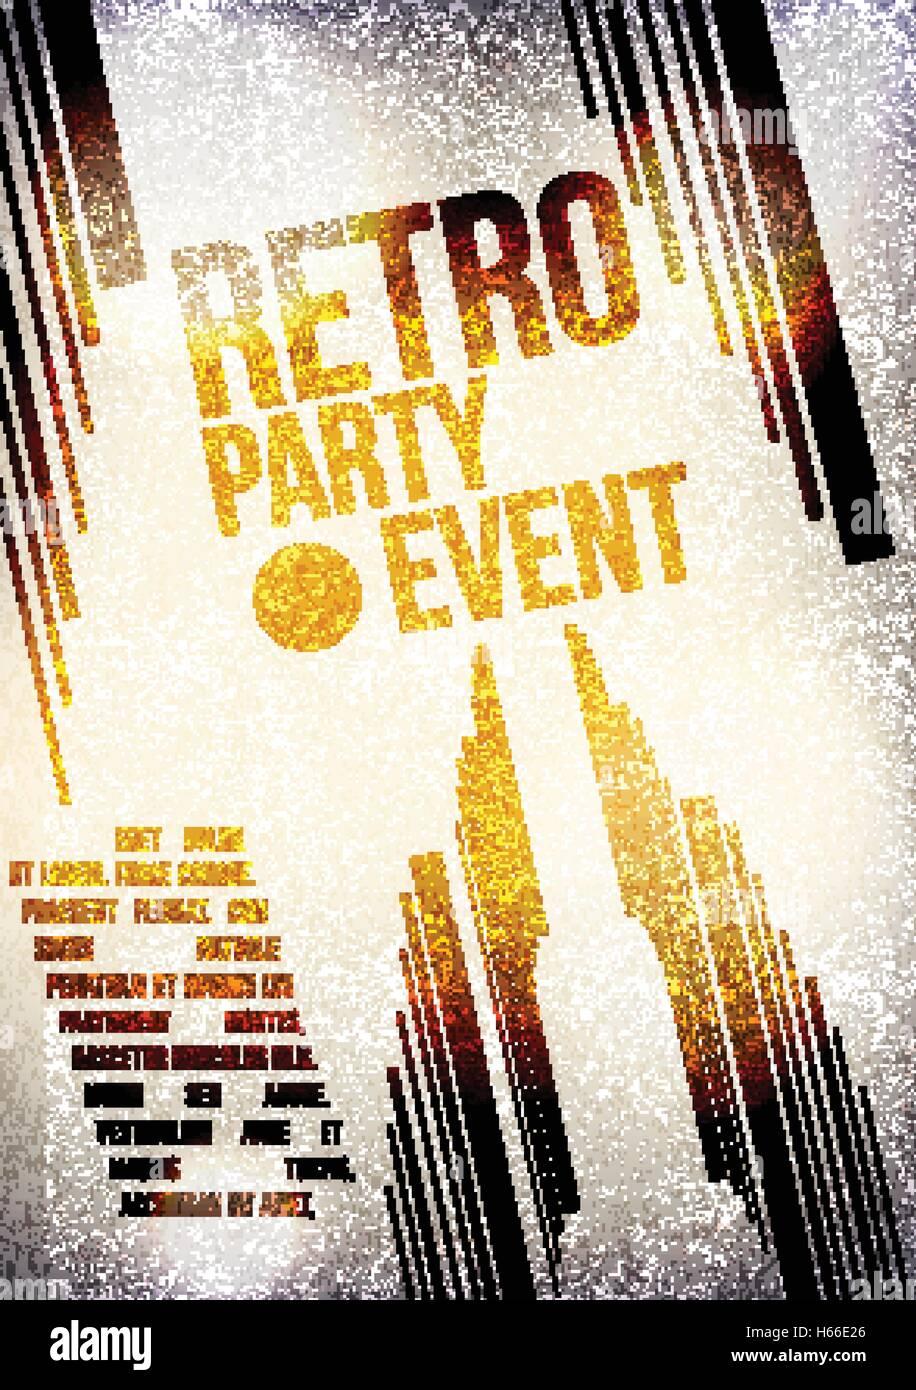 Poster design keywords - Retro Party Invitation Poster Design Vector Illustration